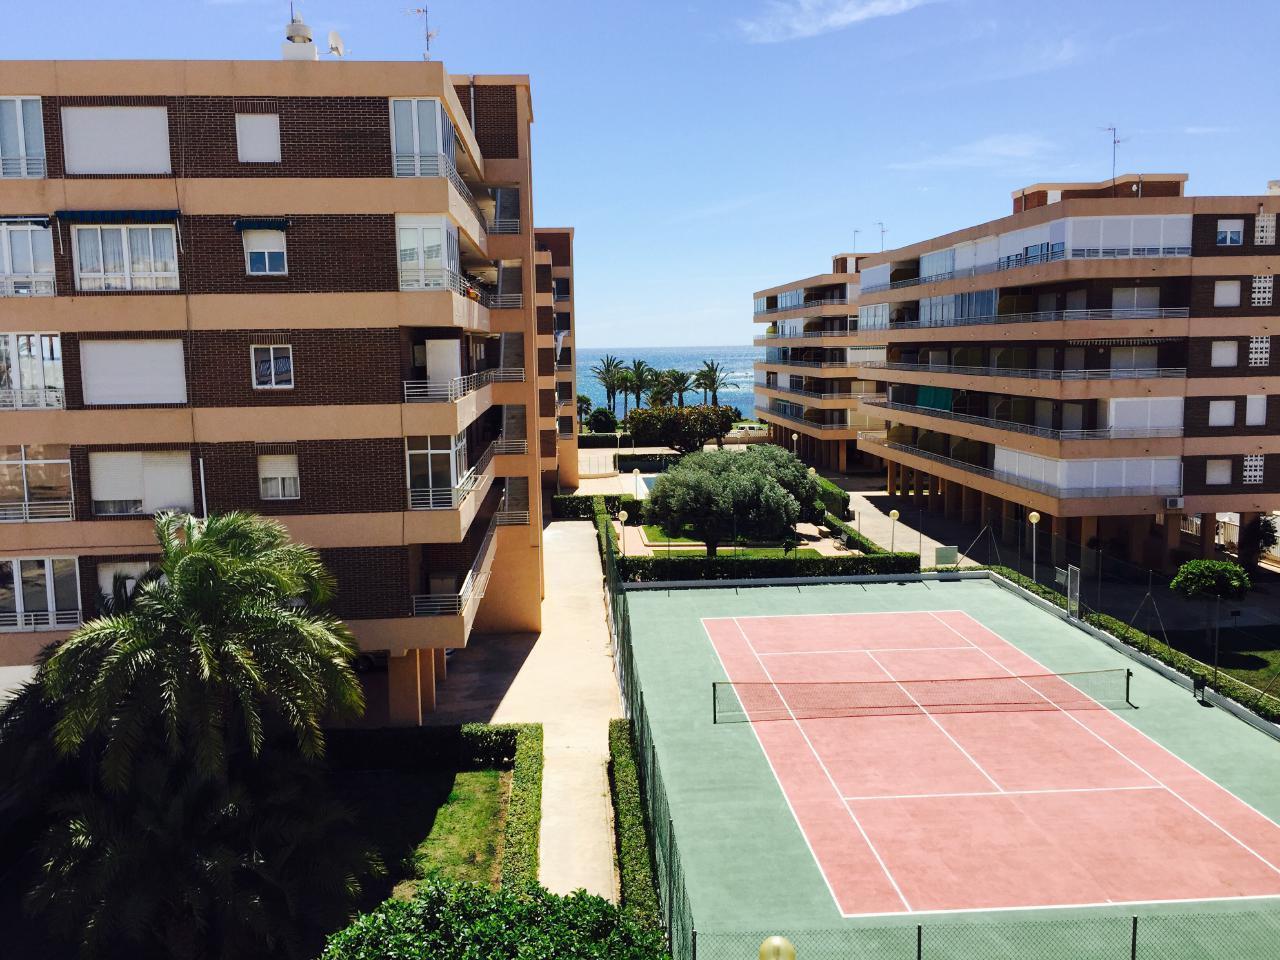 Appartement de vacances Sonnige 3.5 Zi-Wohnung am Meer (1026876), Torrevieja, Costa Blanca, Valence, Espagne, image 3